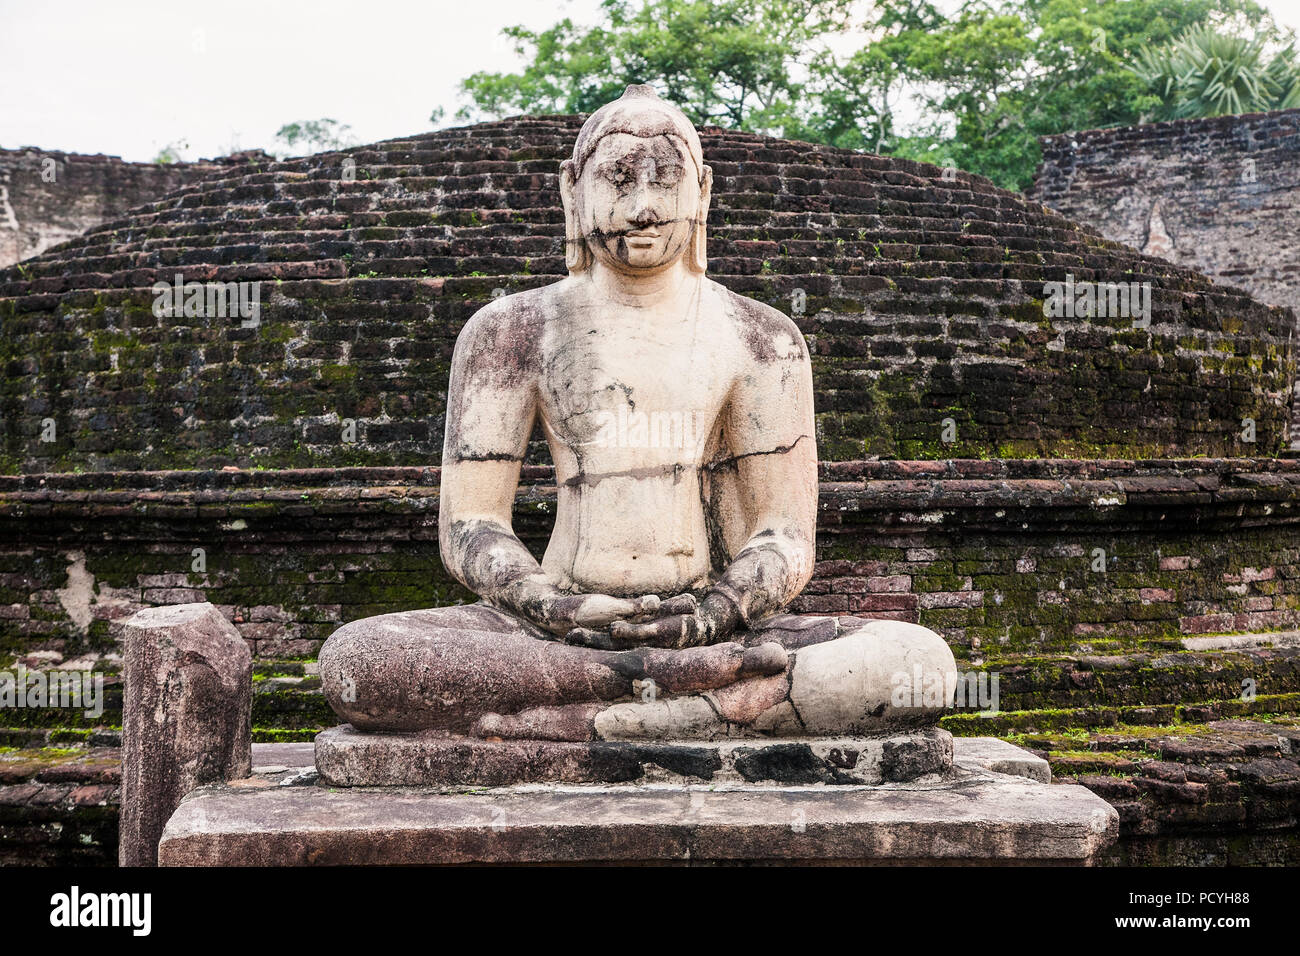 Buddhan dating sitesdating nainen gynekologi